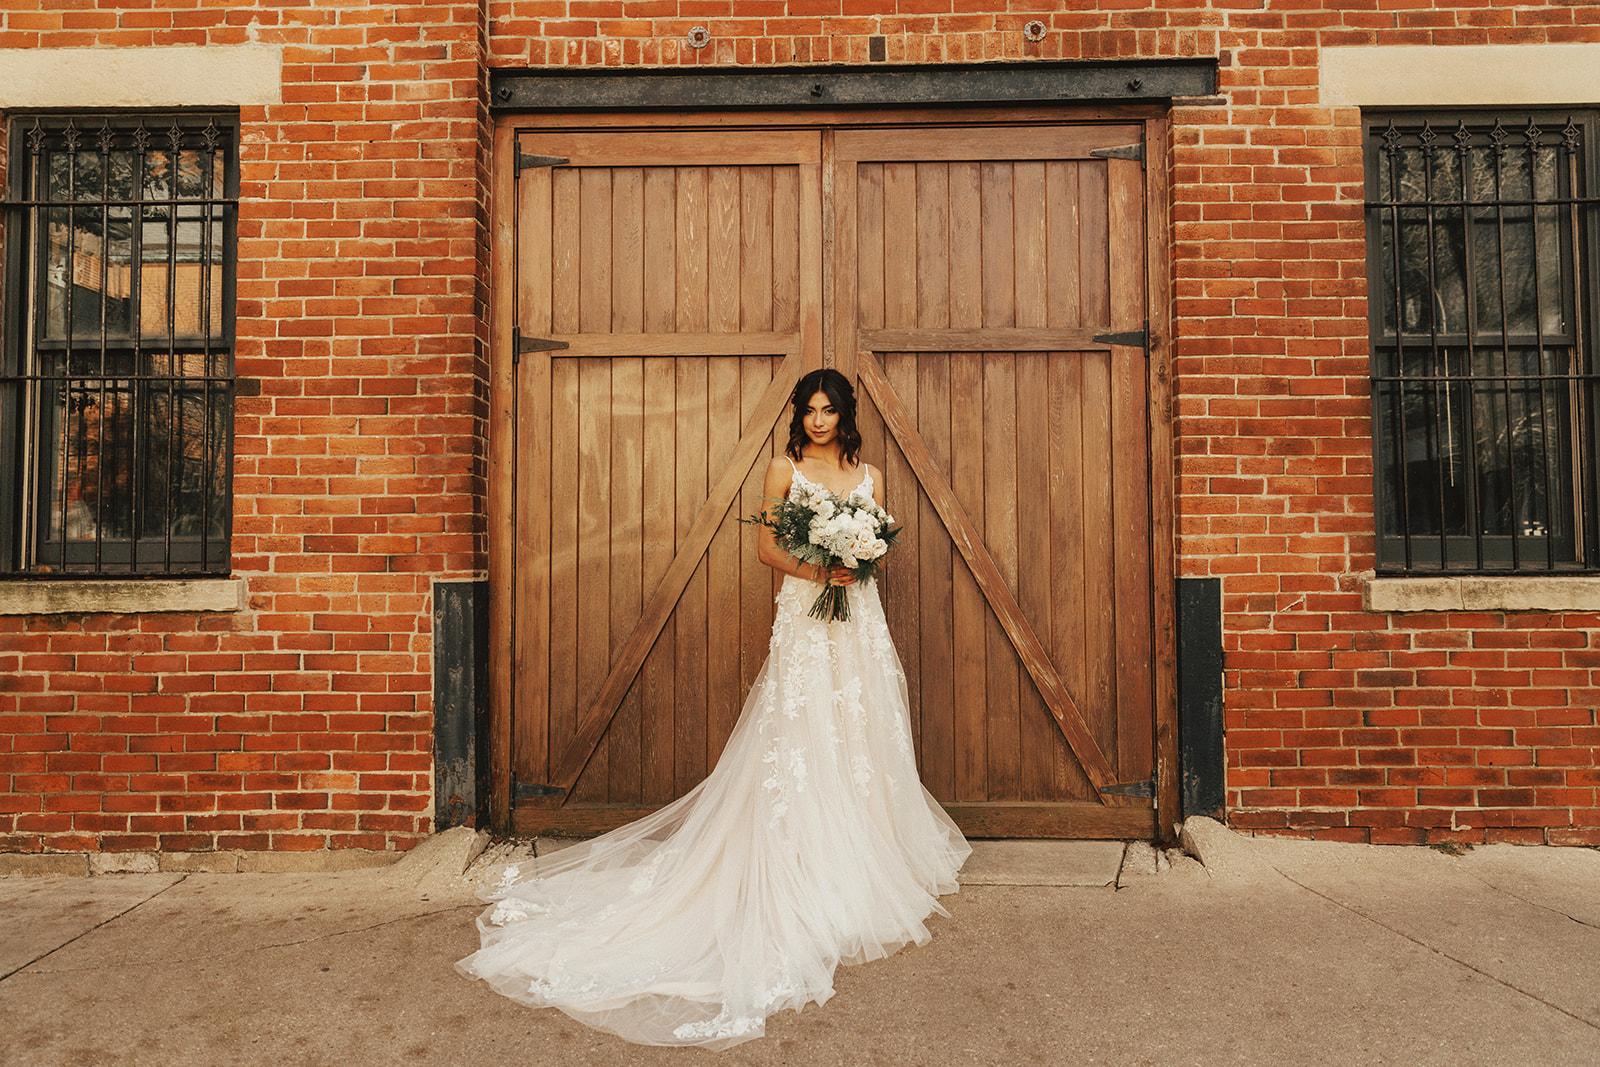 Winter Wedding Chicago Gold Wedding White Floral | Chicago Wedding Planner | Your Day by MK